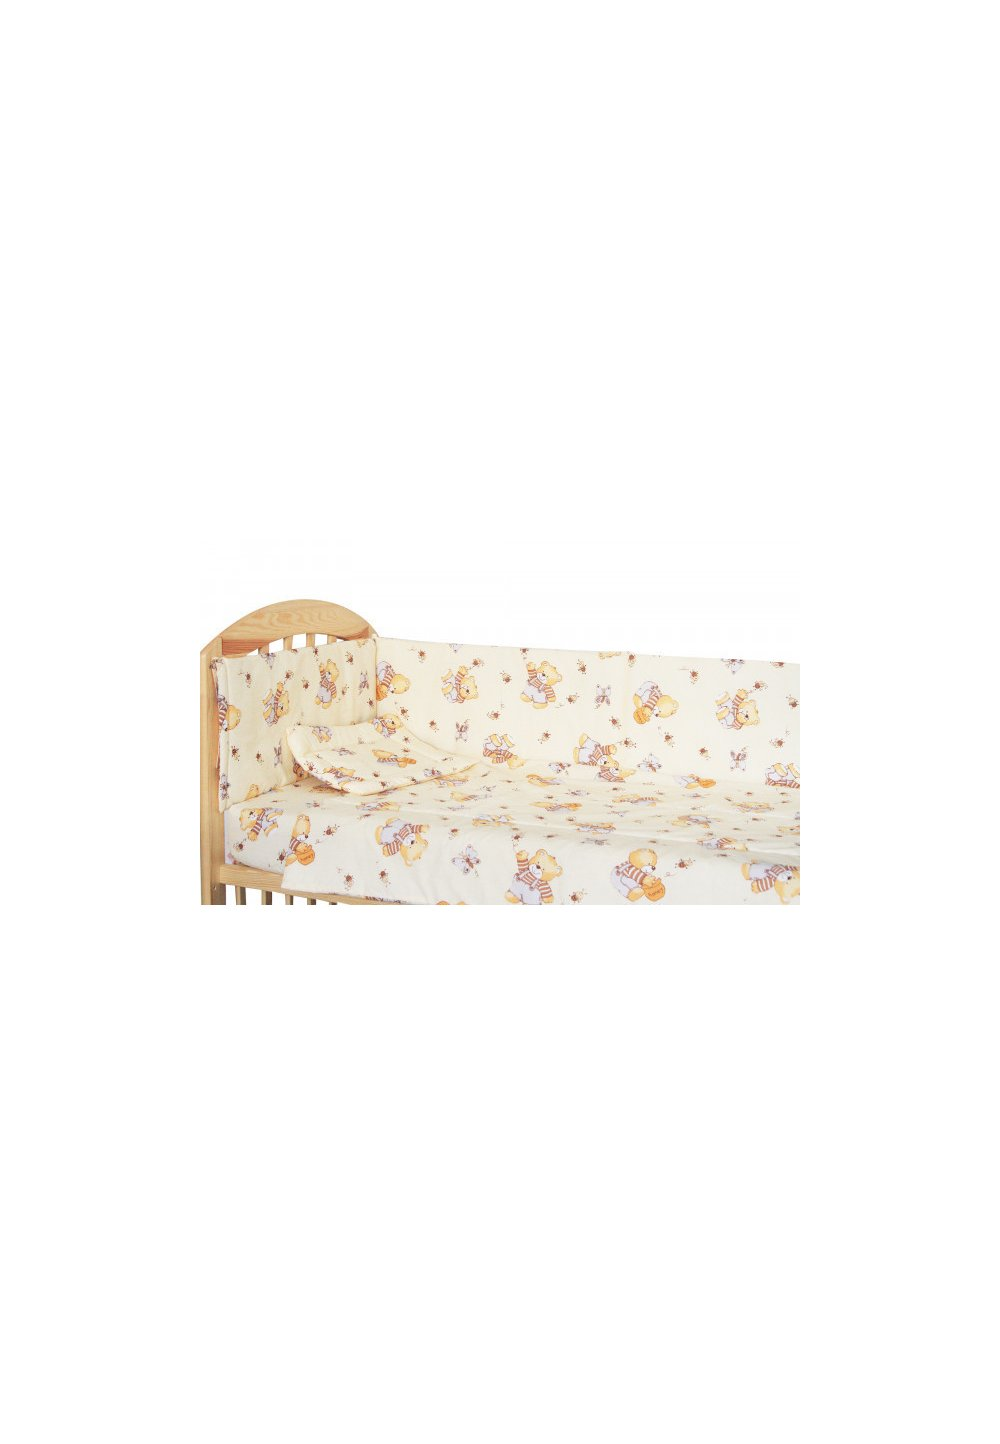 Lenjerie patut, 5 piese, Ursulet brownie, 140 x 70 cm imagine